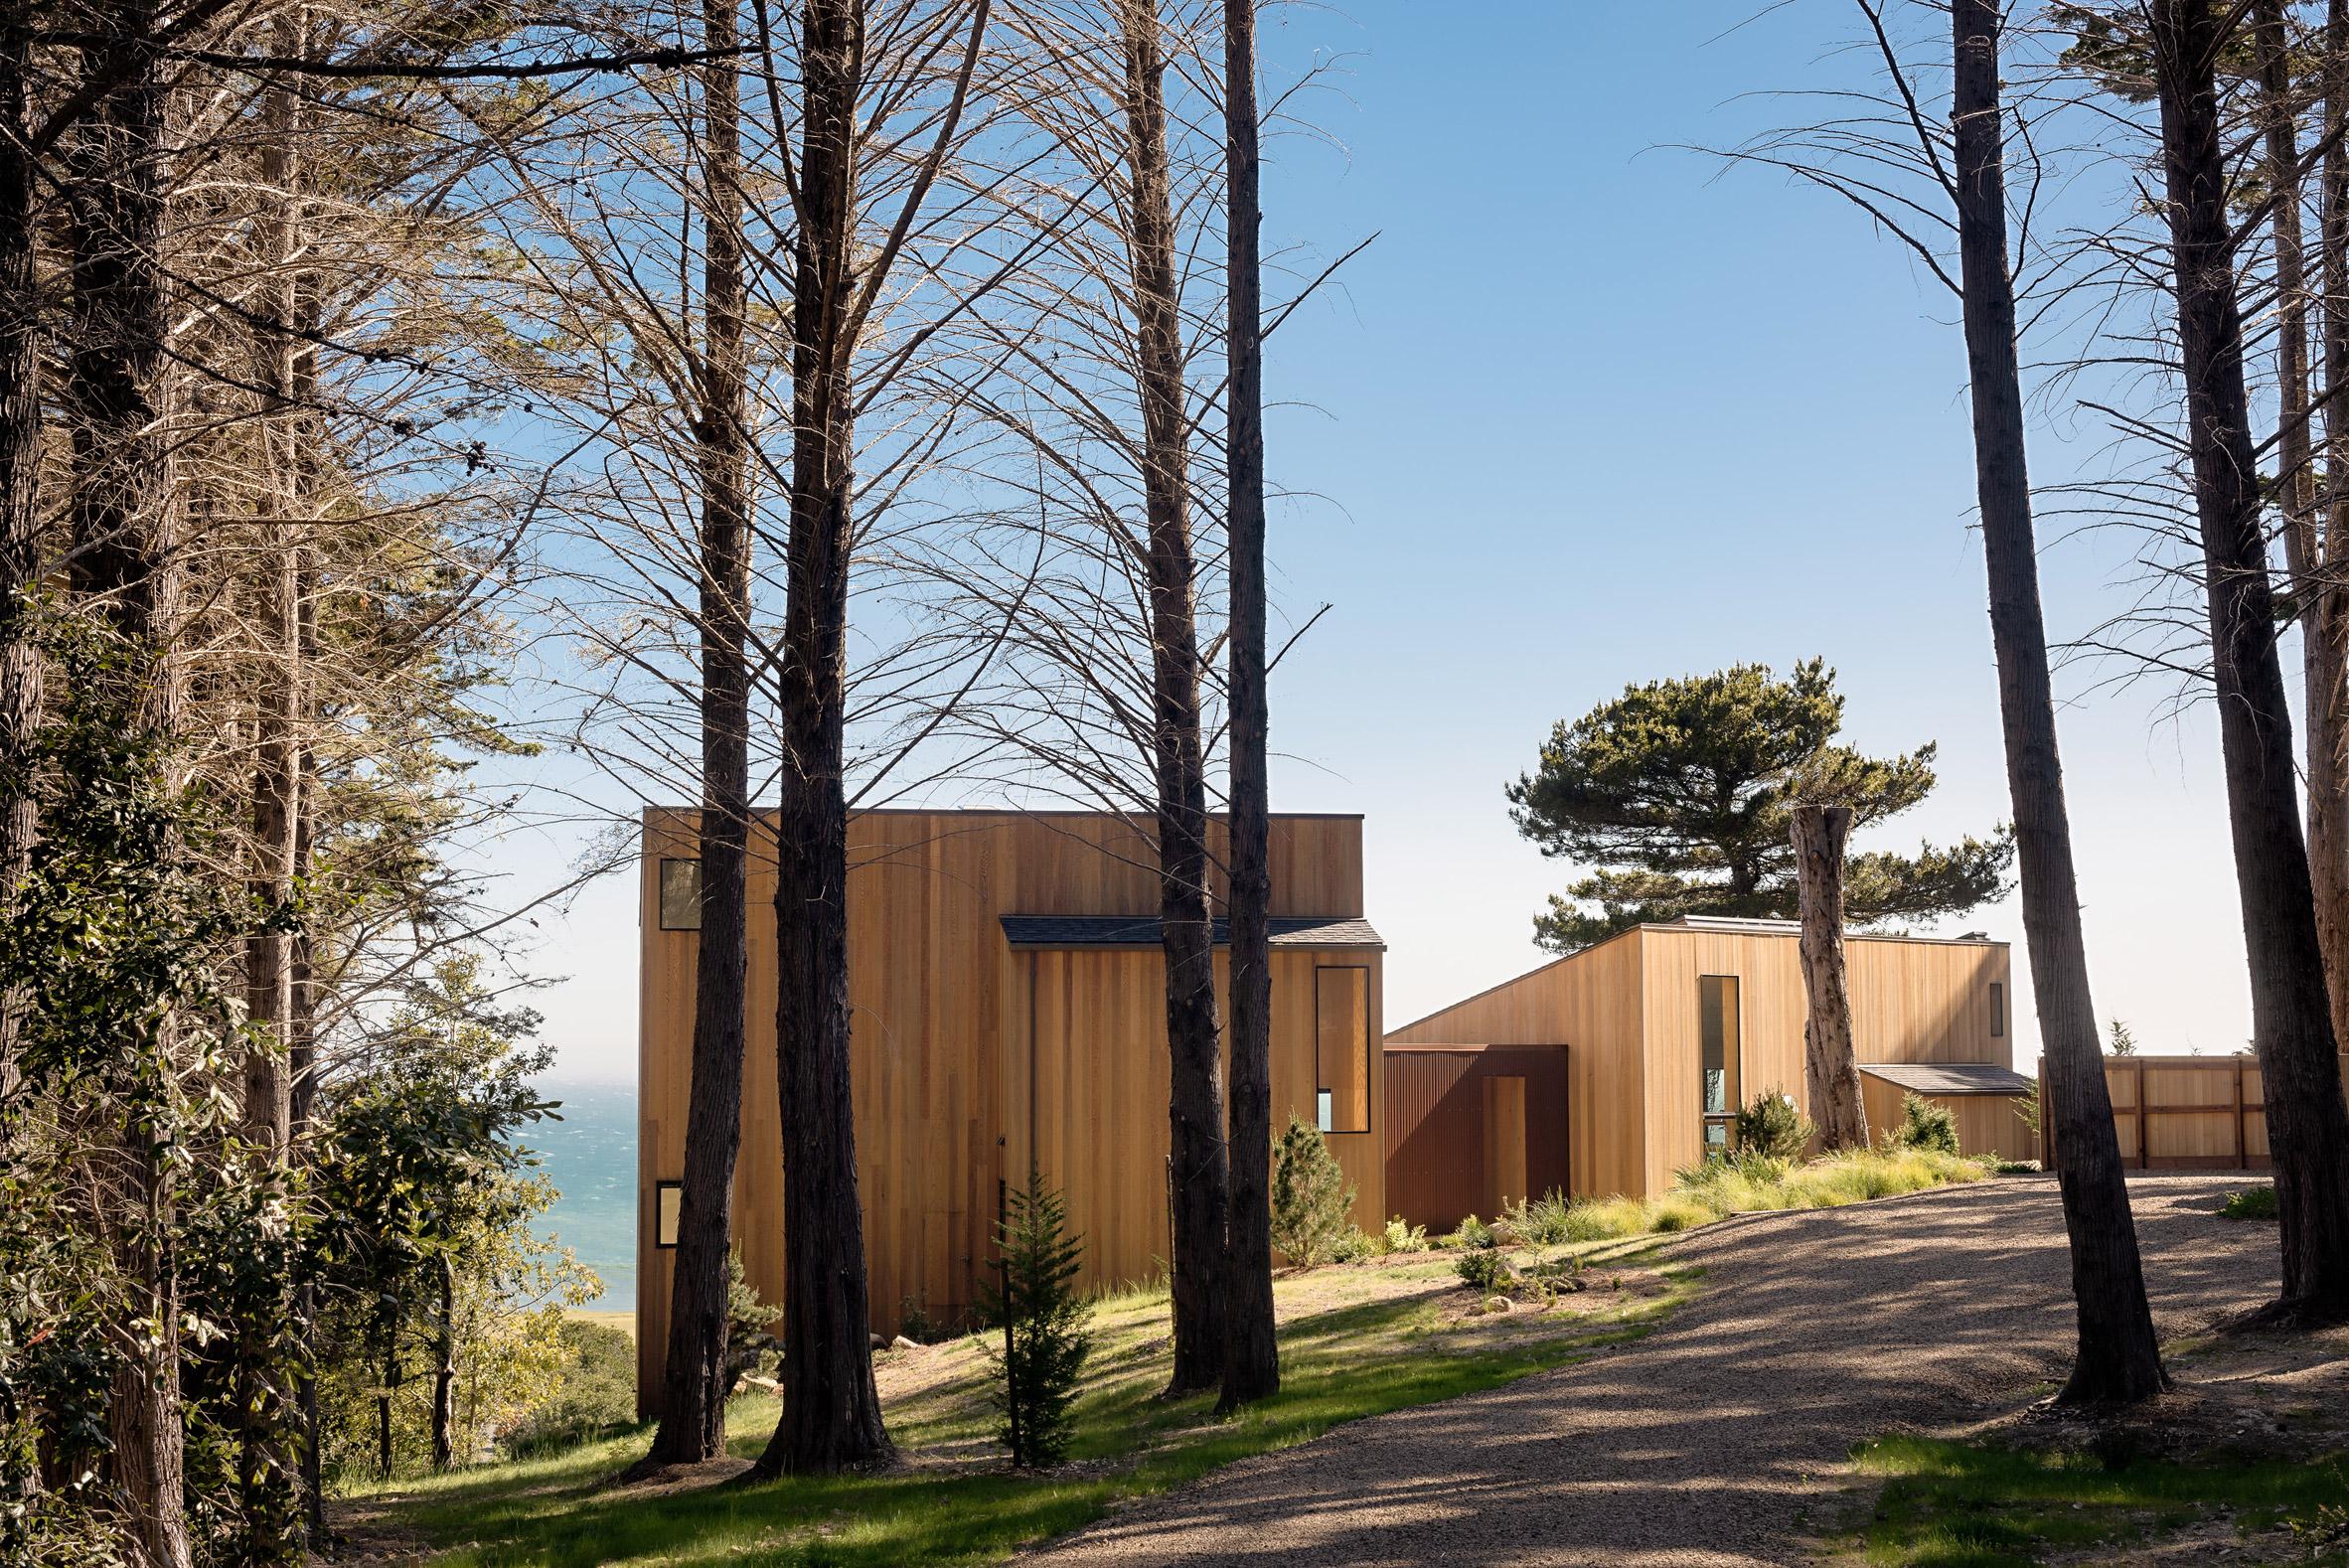 nhà bên biển coastal-retreat-malcolm-davis-architecture-sea-ranch-sonoma-county-califorinia-relaxing-space-elledecoration vn 3